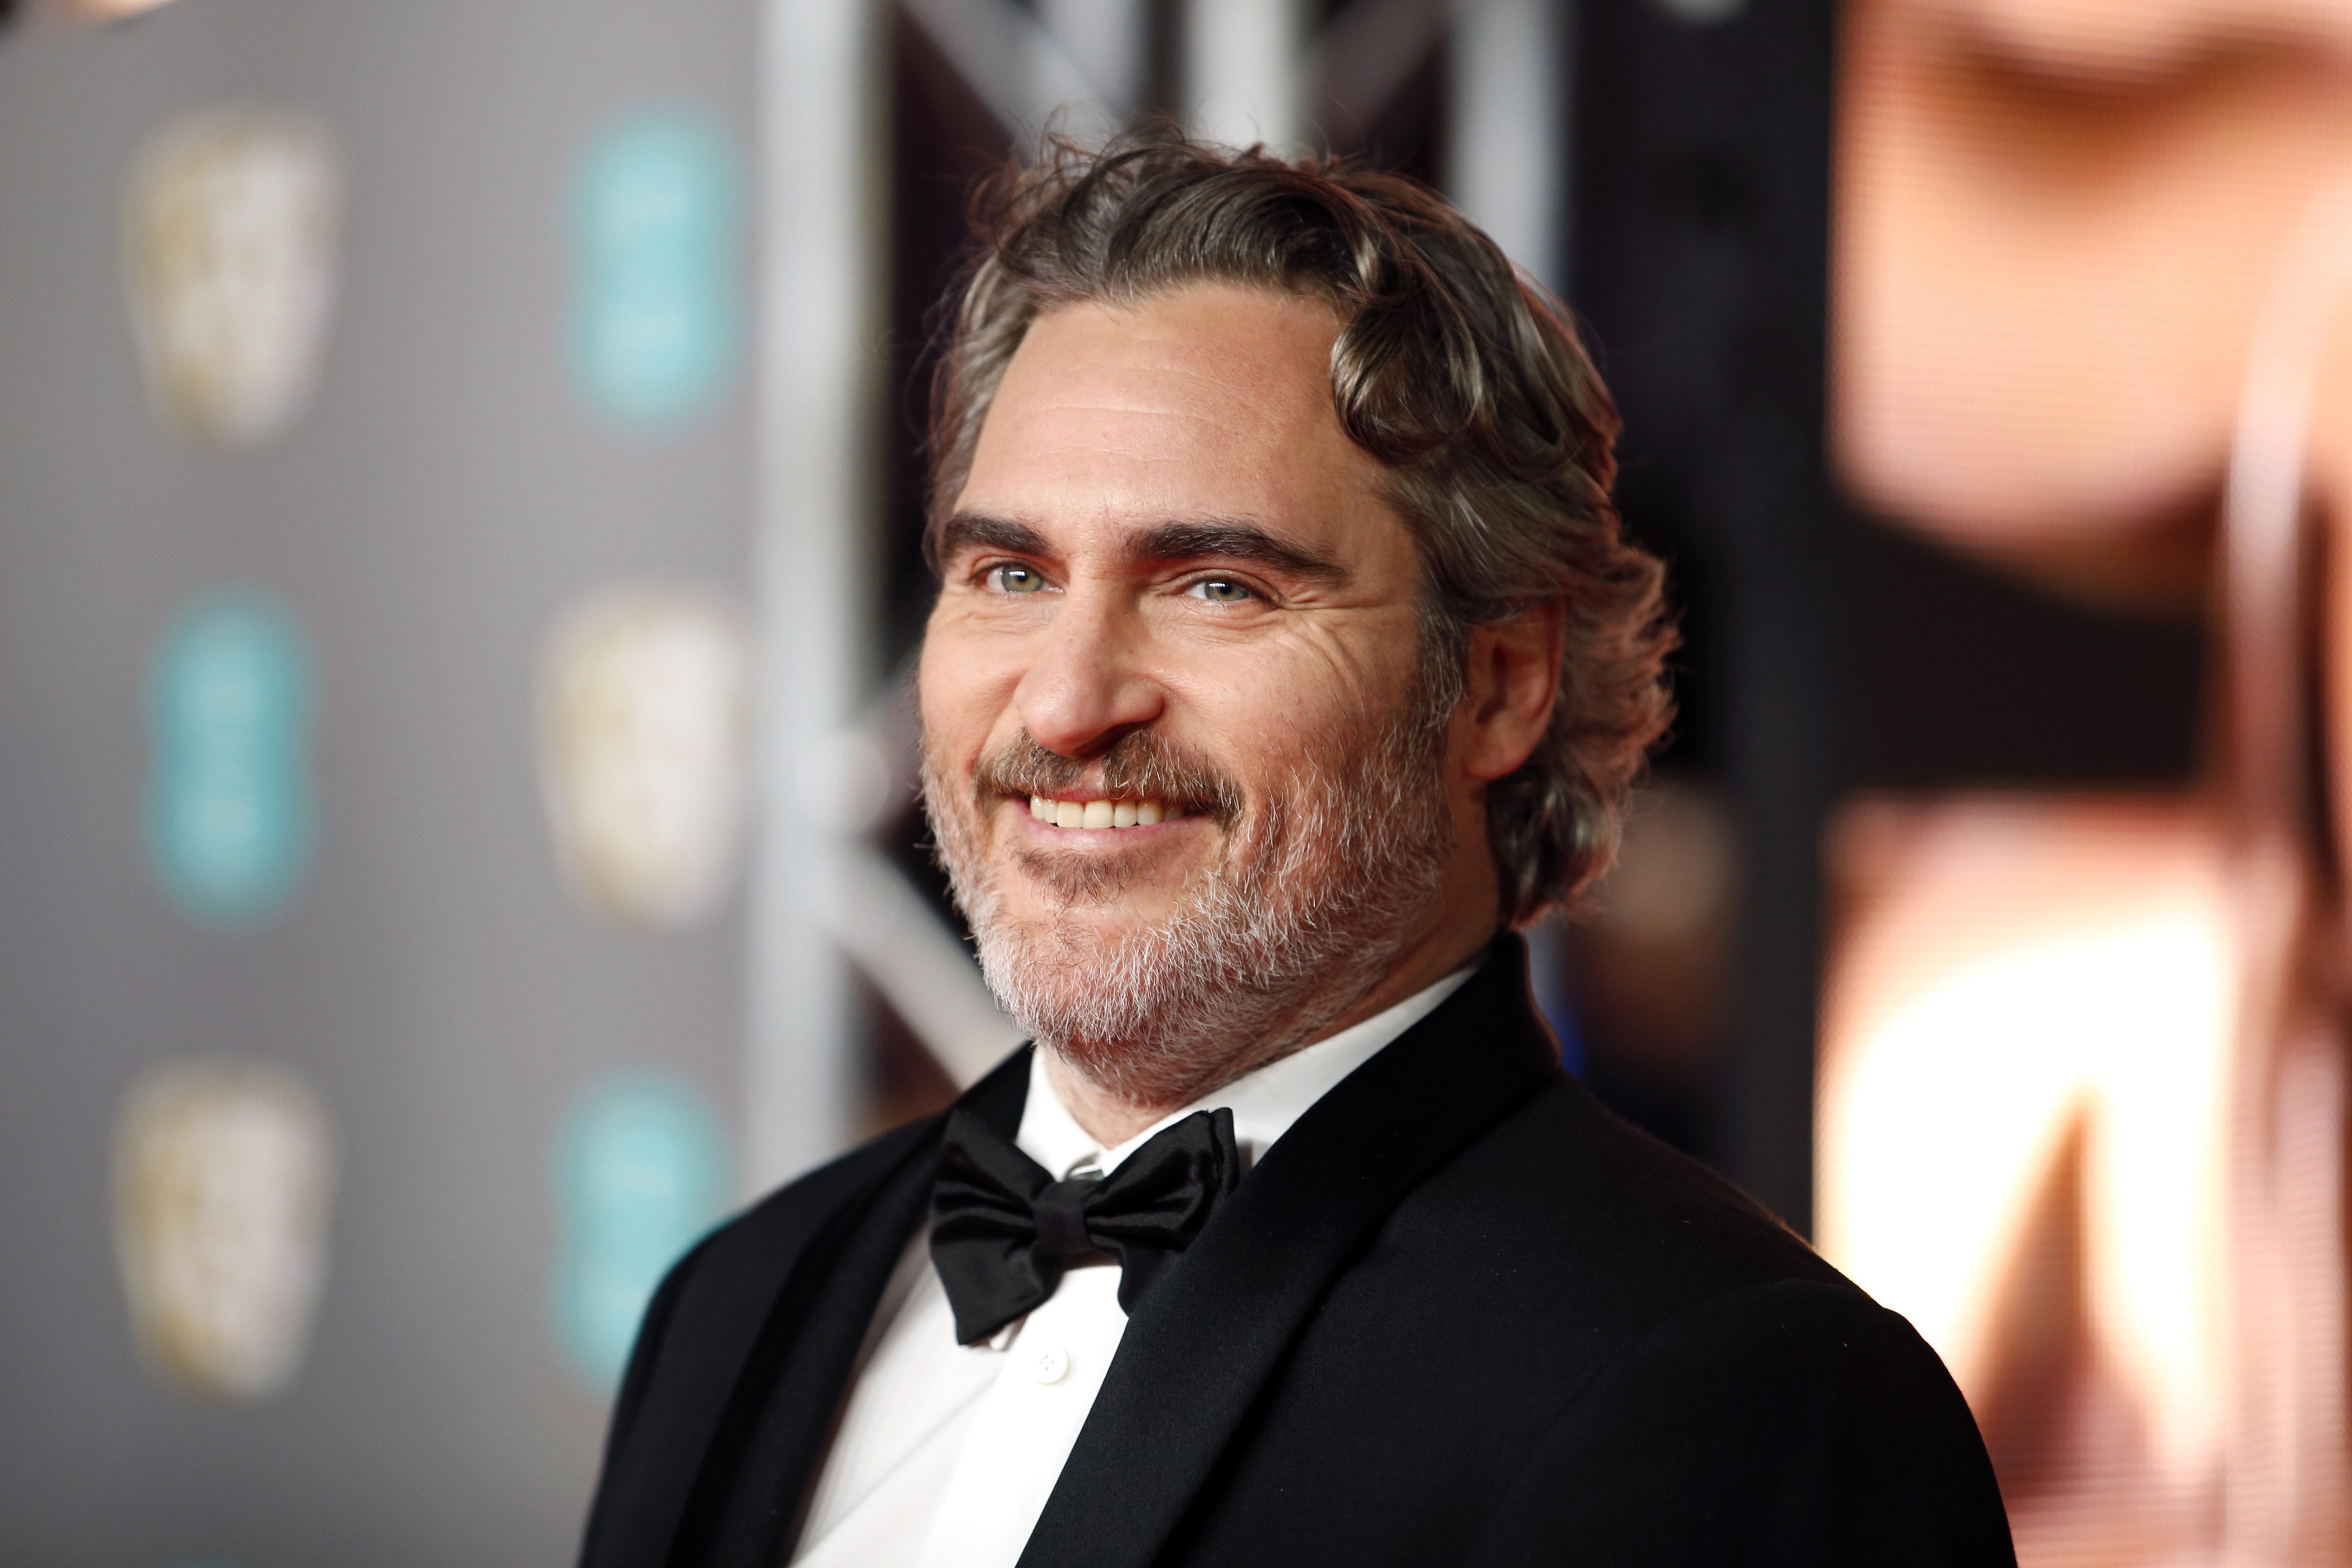 BAFTA Awards Winners List (Updating Live)